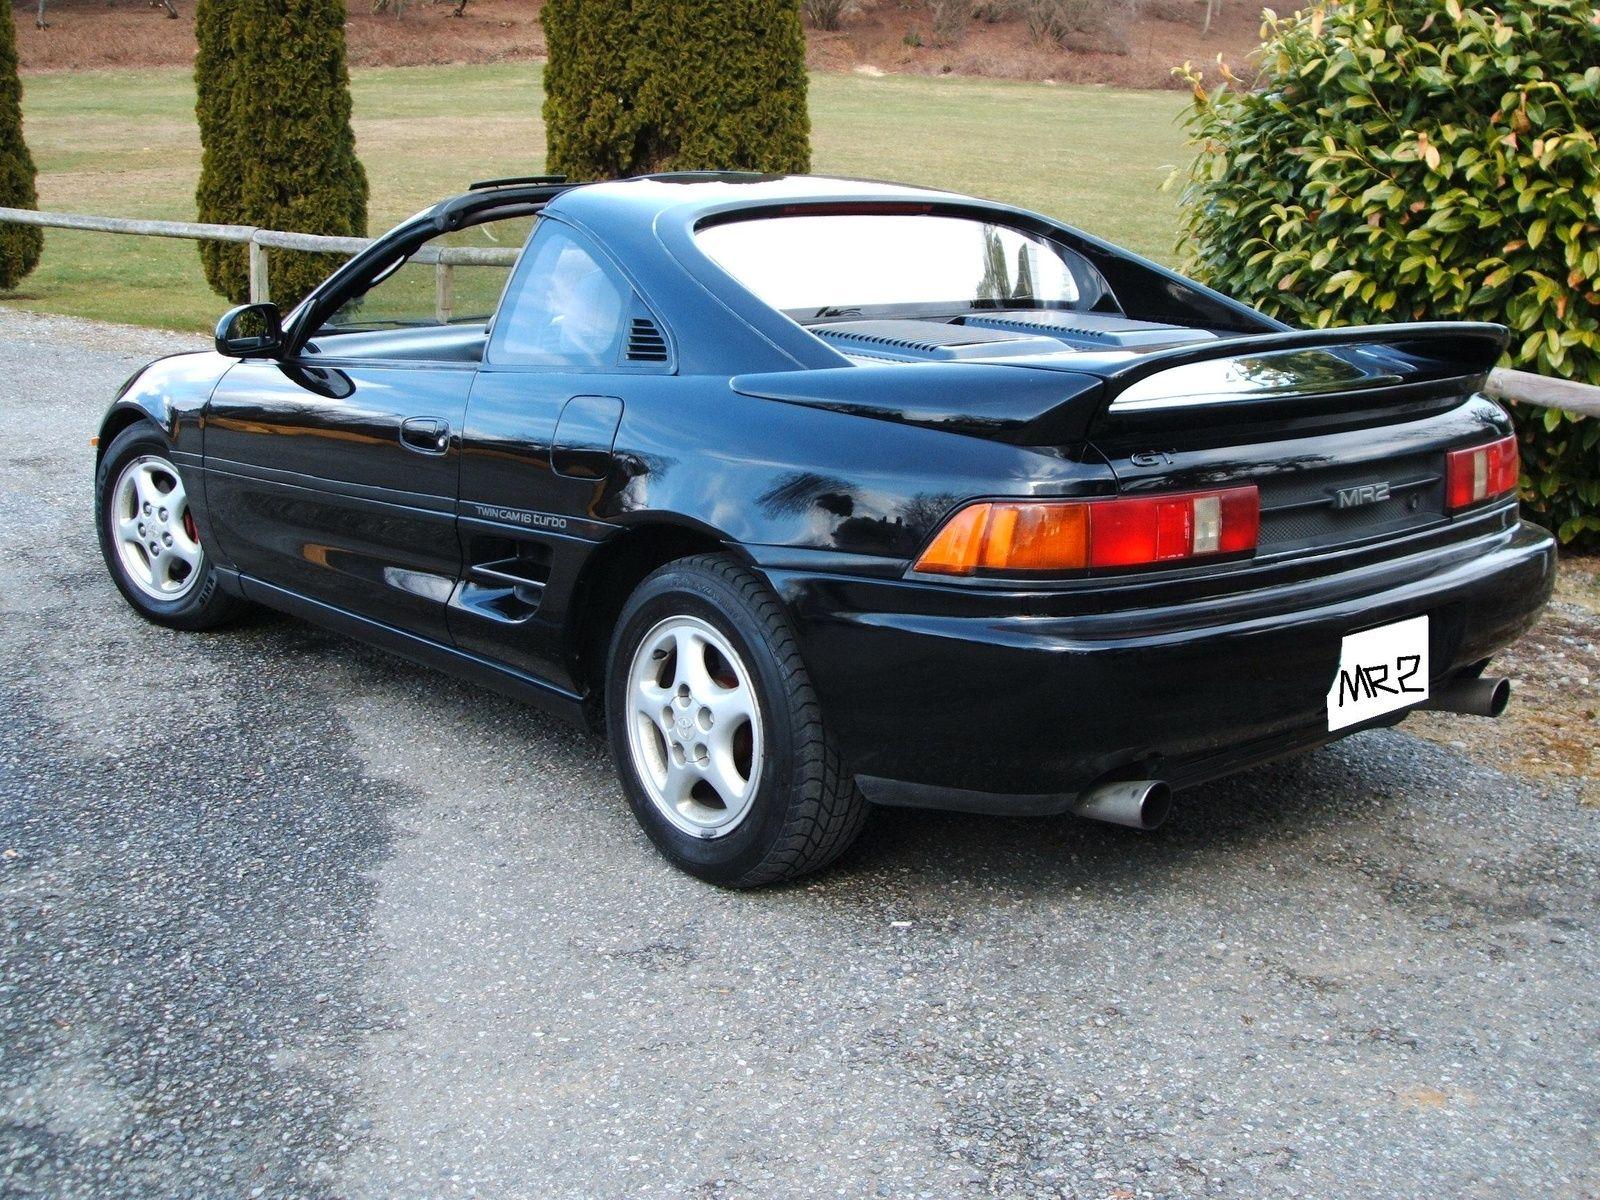 Kekurangan Mazda Mr2 Perbandingan Harga